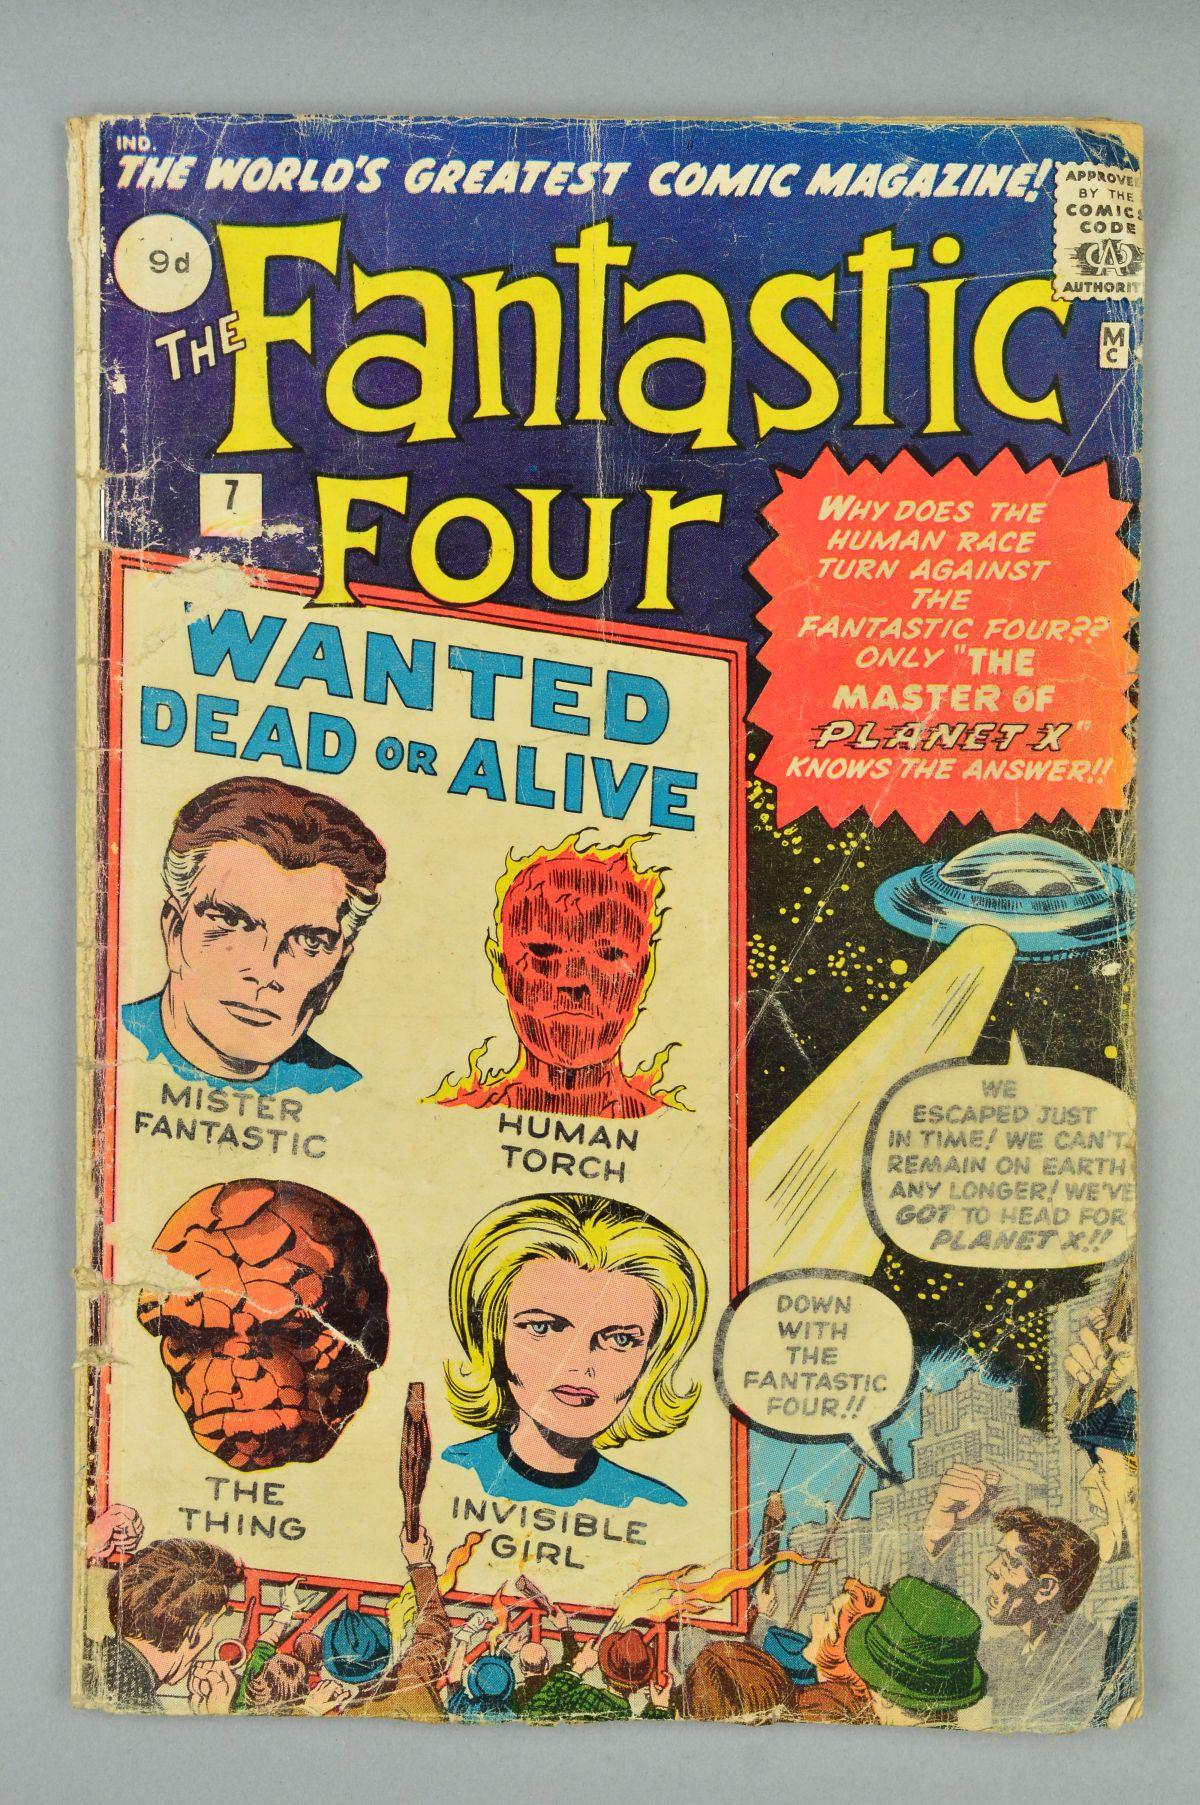 Lot 1807 - Fantastic Four (1961) #7, Published:October 01, 1962, Writer:Stan Lee, The Fantastic Four journey